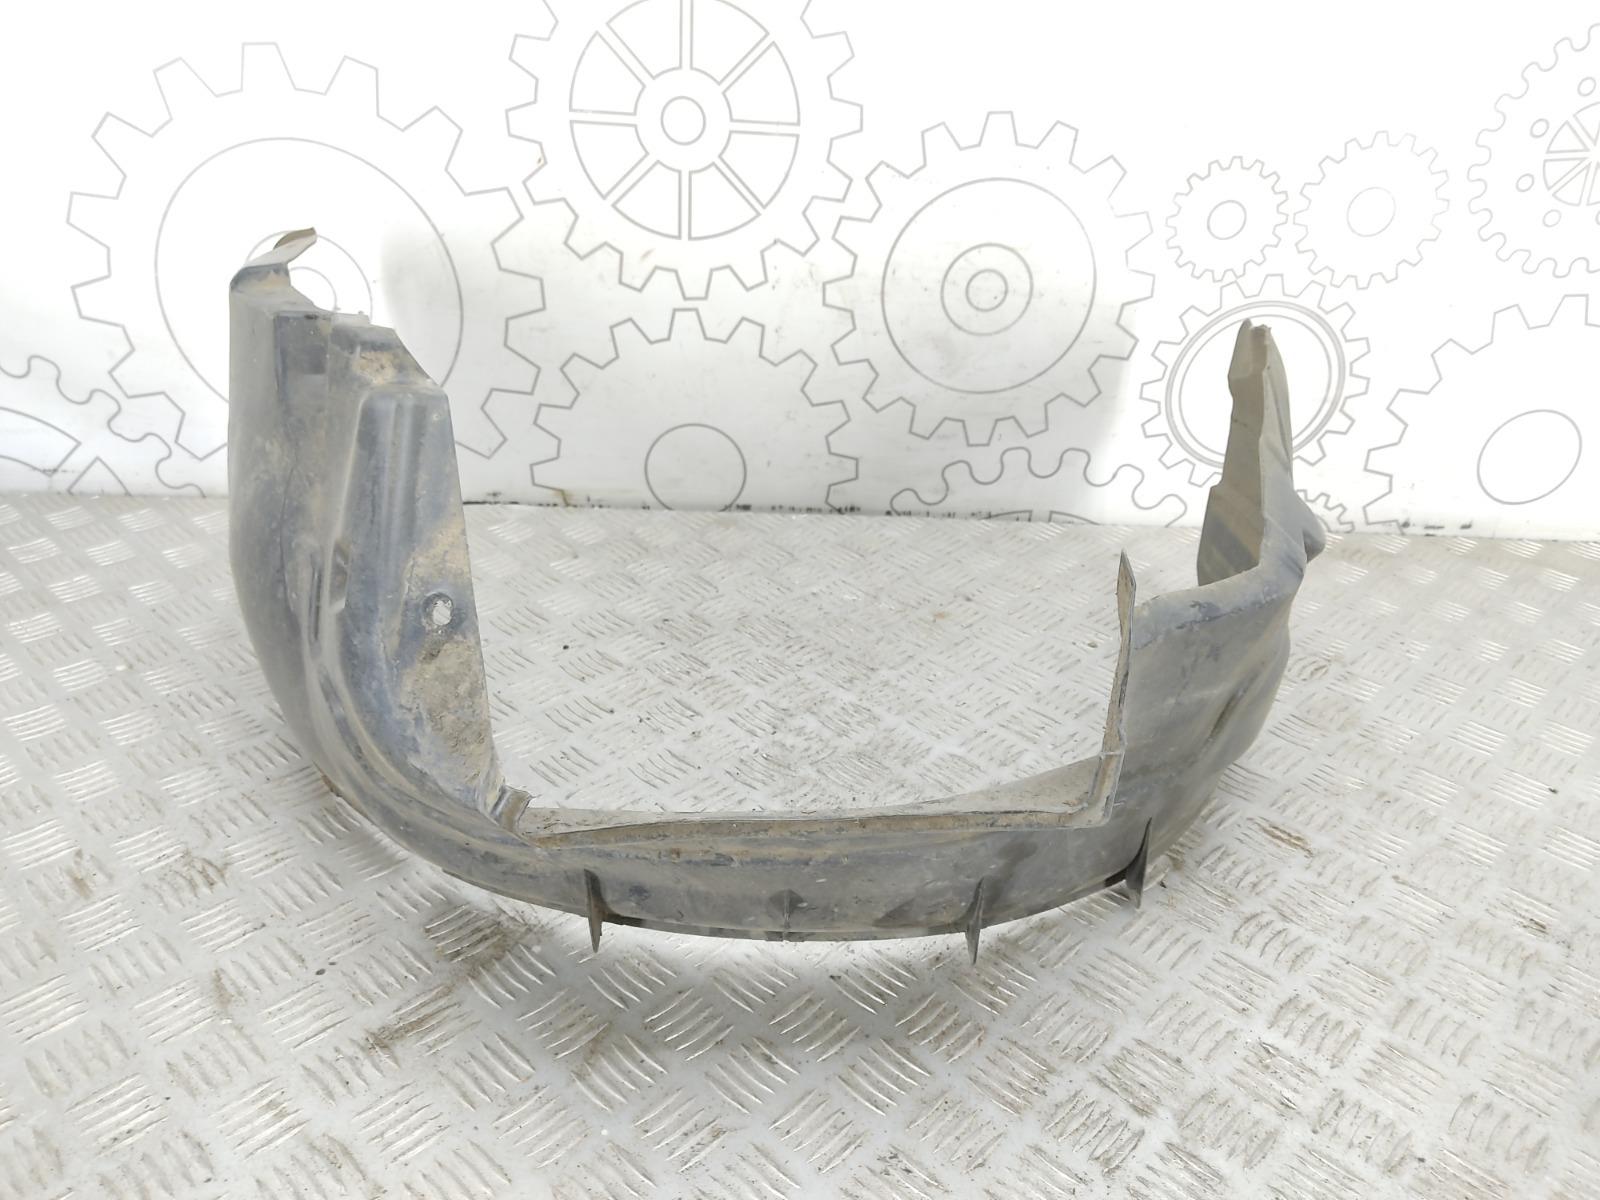 Защита арок передняя левая (подкрылок) Fiat Panda 1.1 I 2006 (б/у)